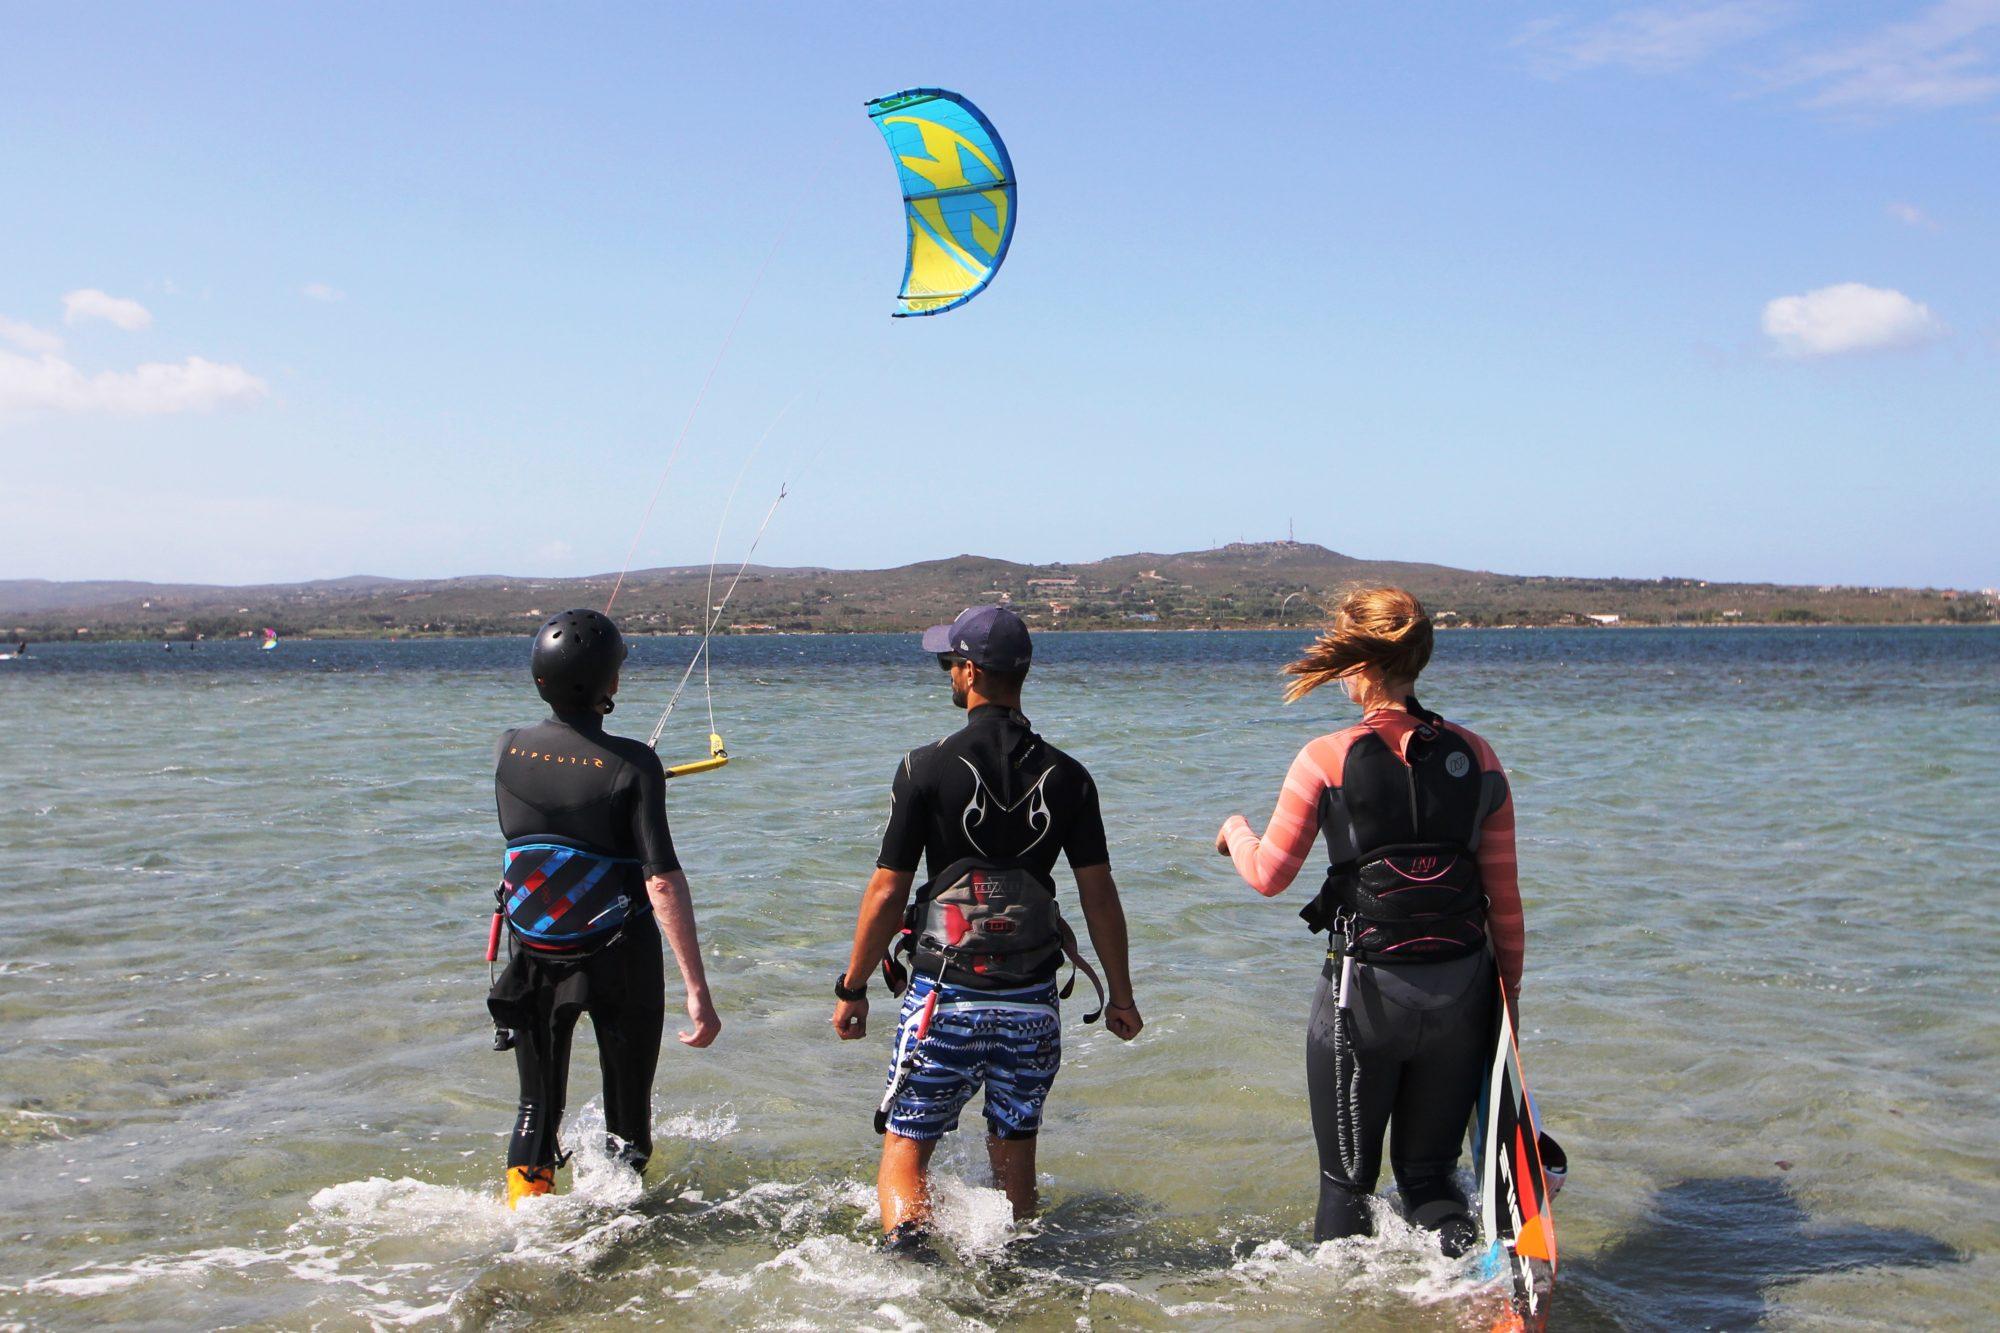 Corso kite completo in Sardegna con KiteGeneration